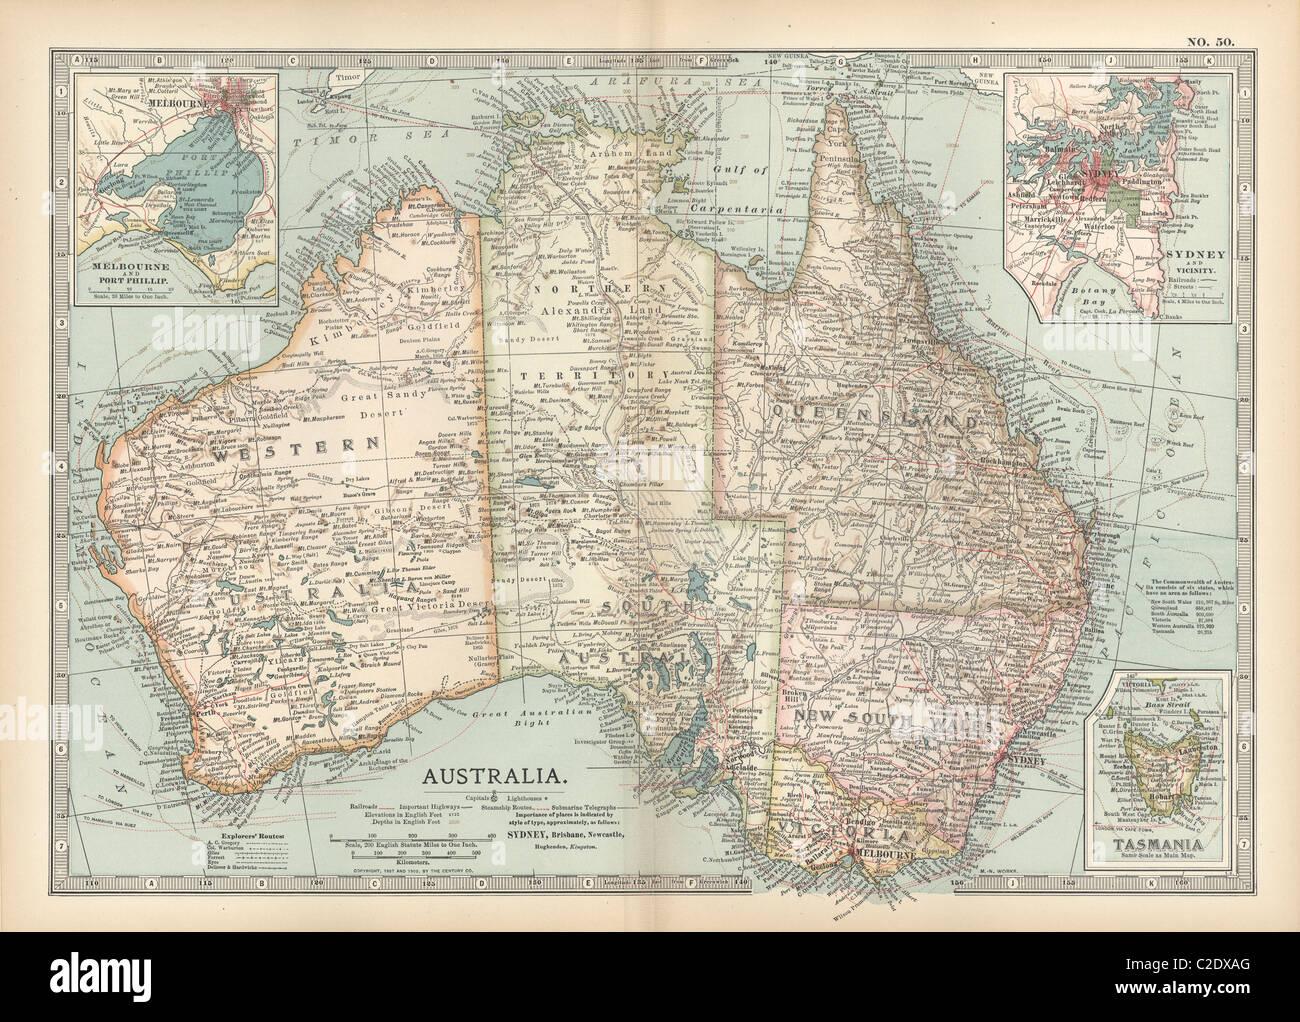 Map Of Australia And Tasmania.Map Of Australia And Tasmania Stock Photo 35956104 Alamy